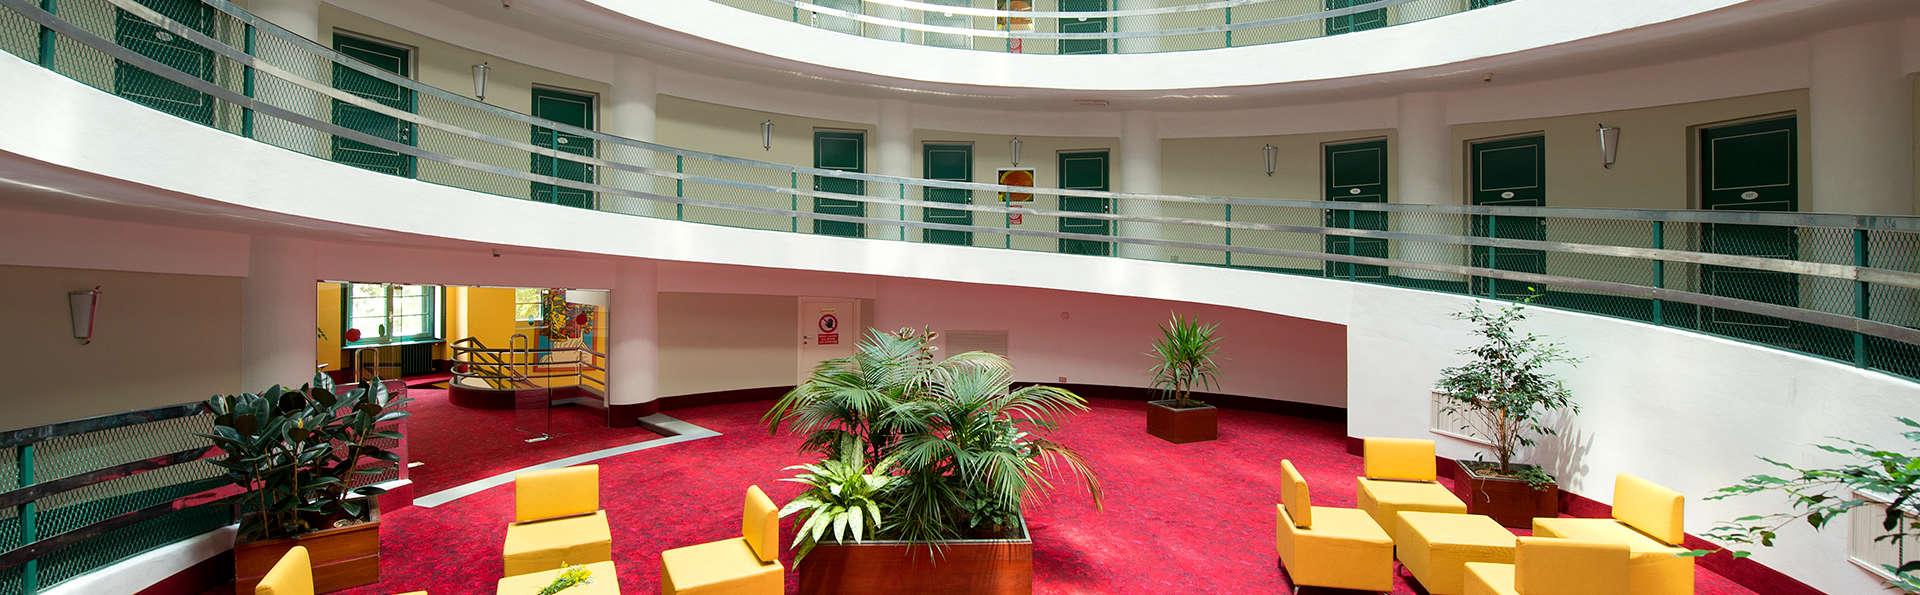 Hotel La Torre SPA & Restaurant - edit_hall.jpg